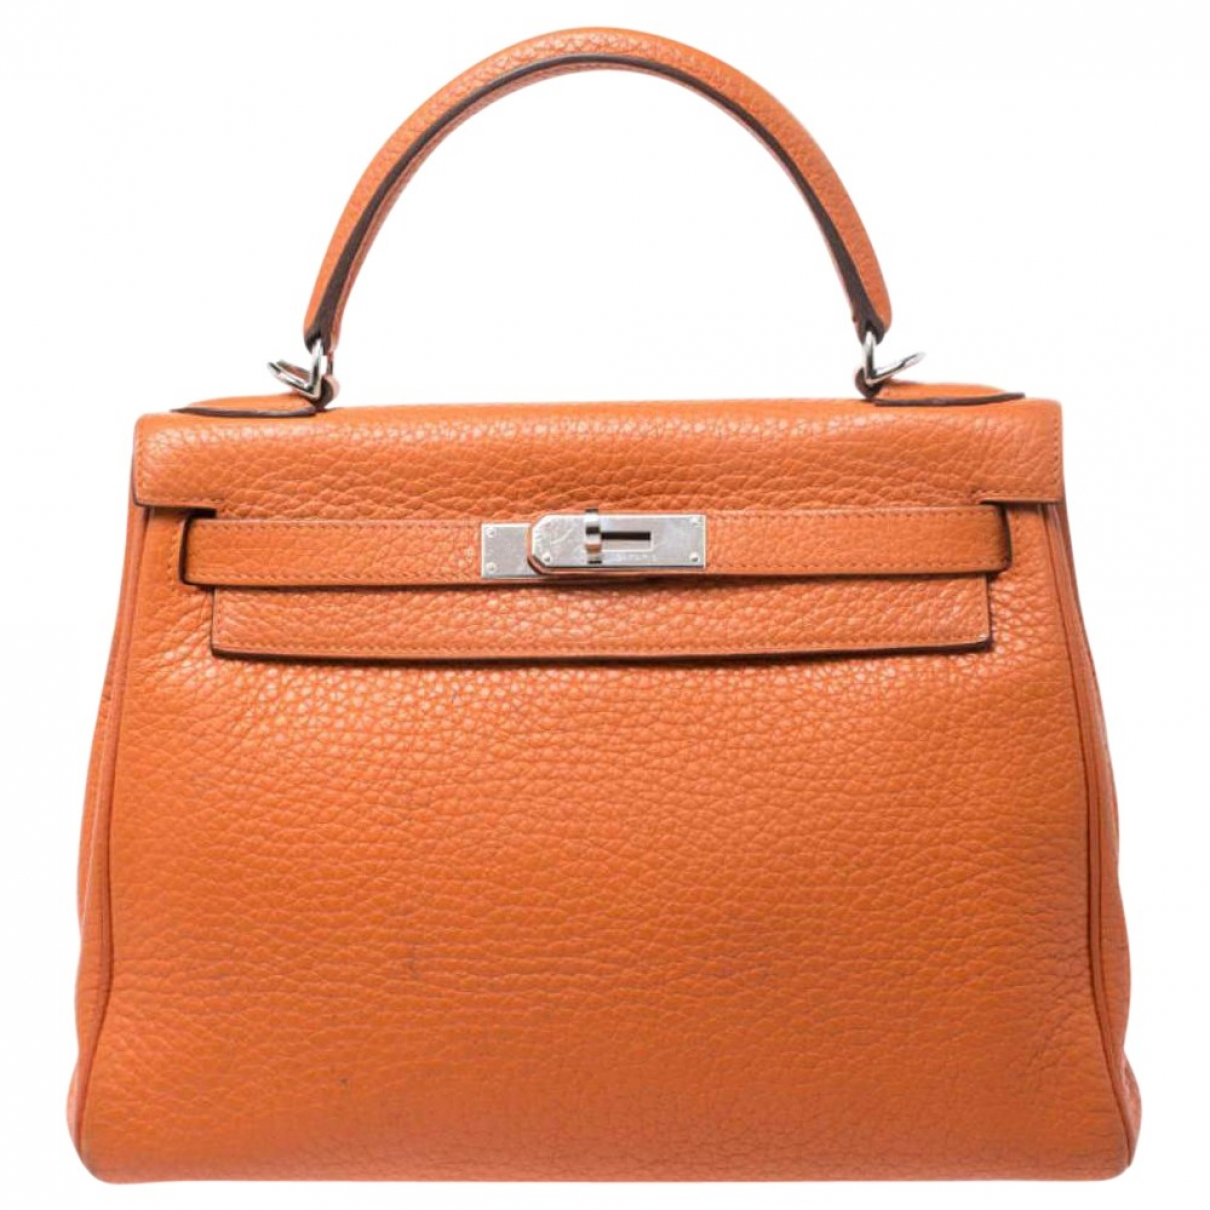 Hermes - Sac a main Kelly 28 pour femme en cuir - orange